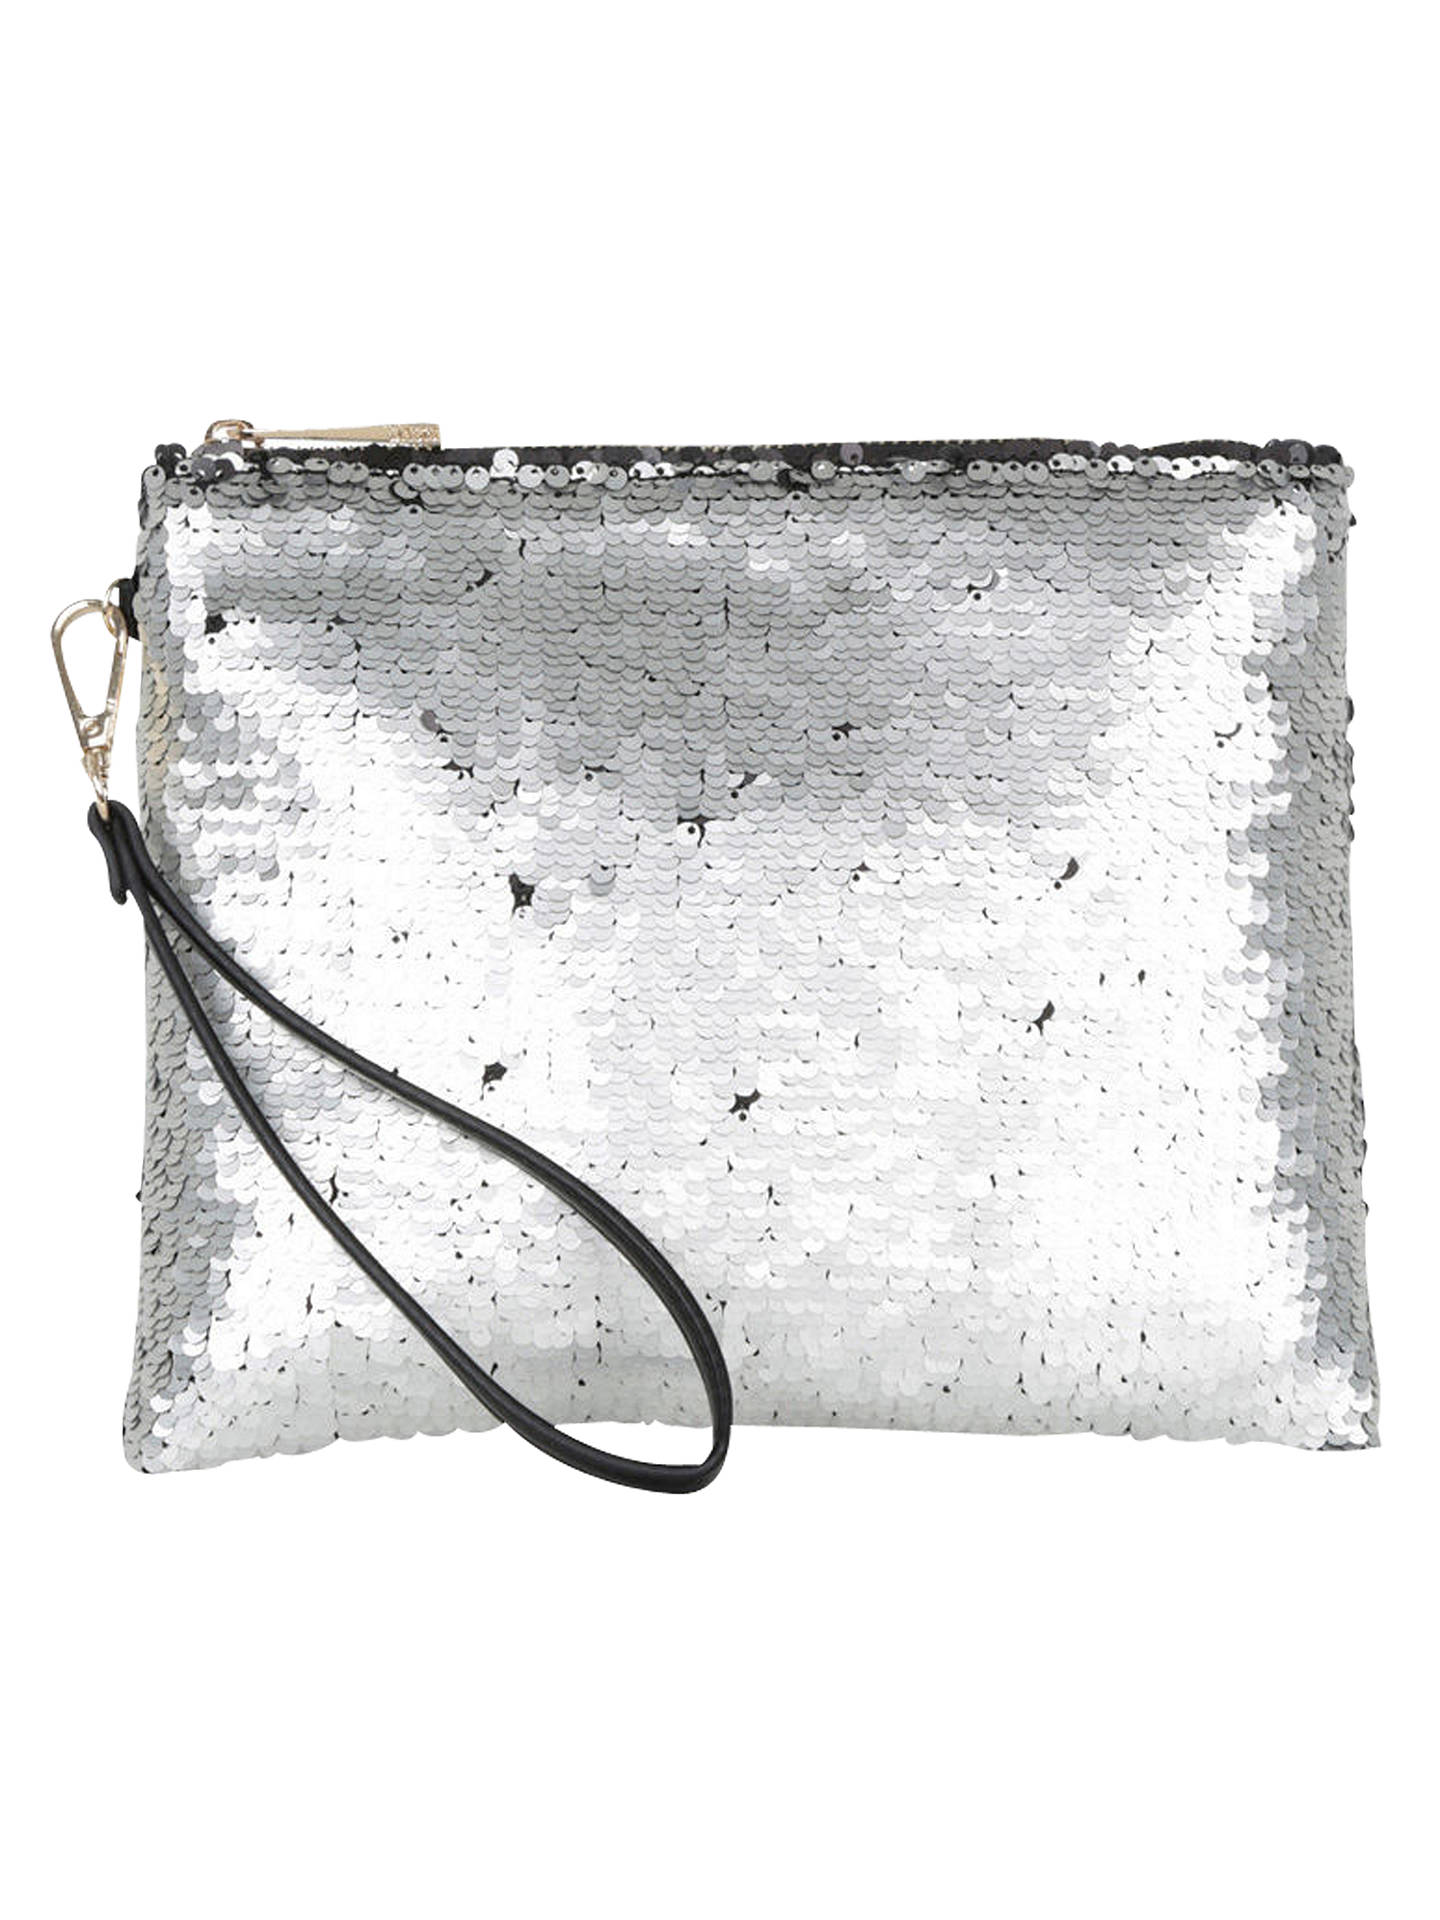 317402e2866d Buy Oasis Sequin Clutch, Silver Online at johnlewis.com ...